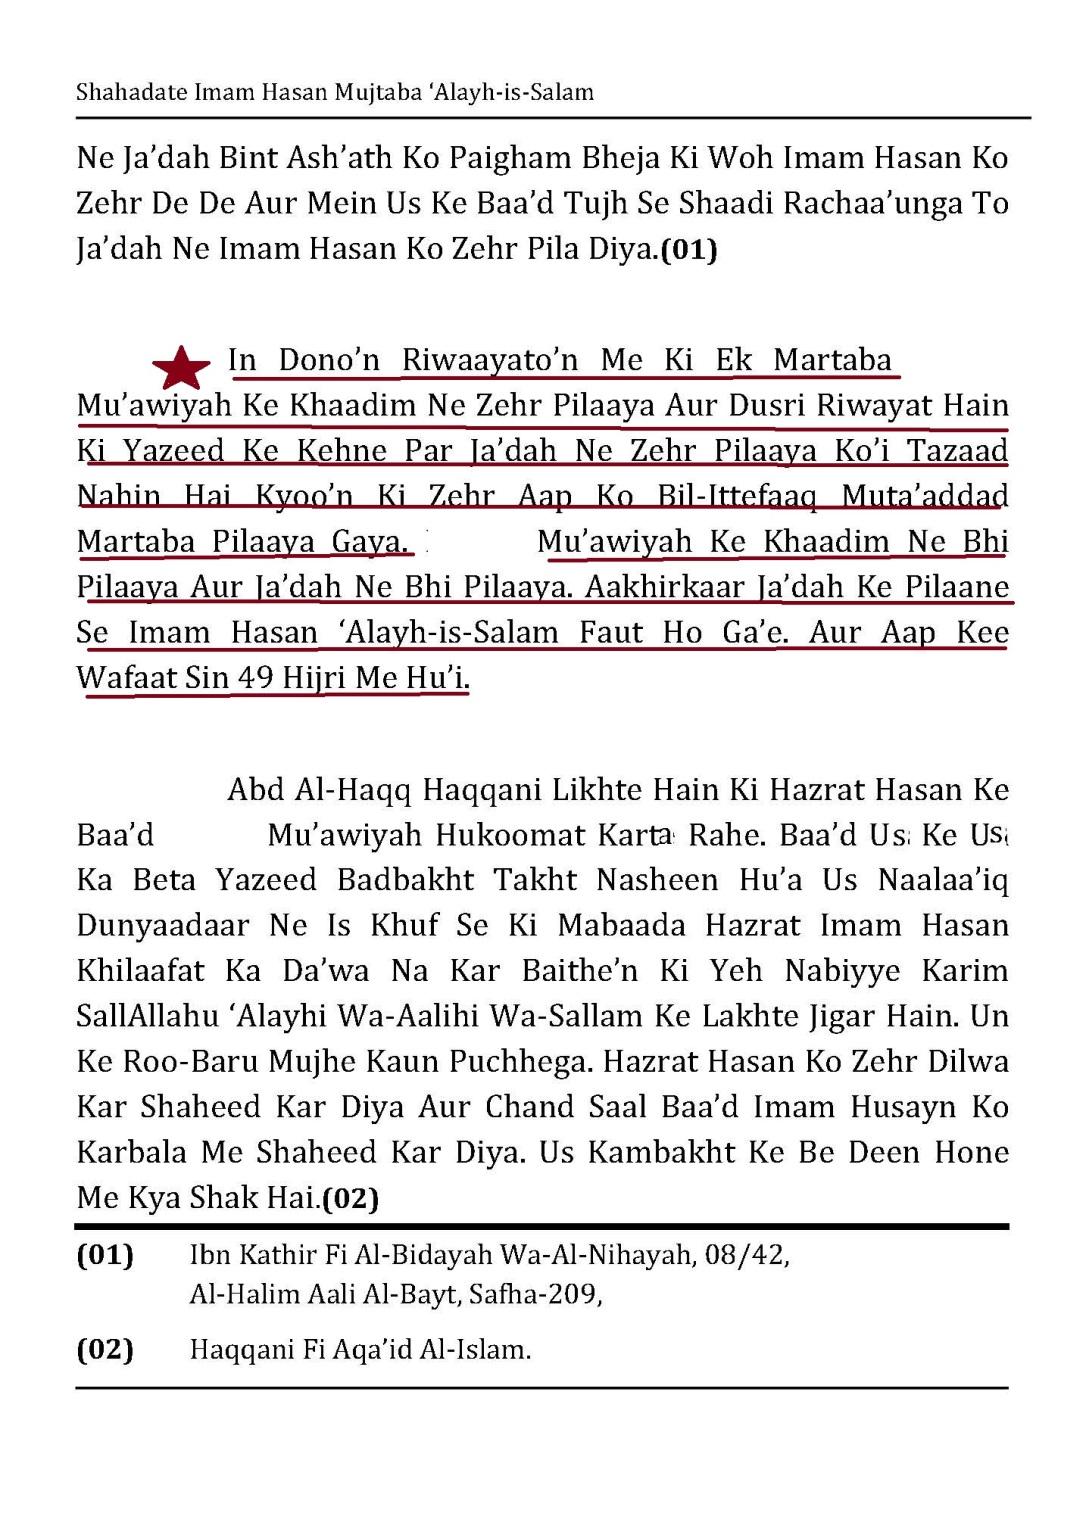 shahadate-imam-hasan-mujtaba-e28098alayh-is-salam-pdf_unlocked_Page_09